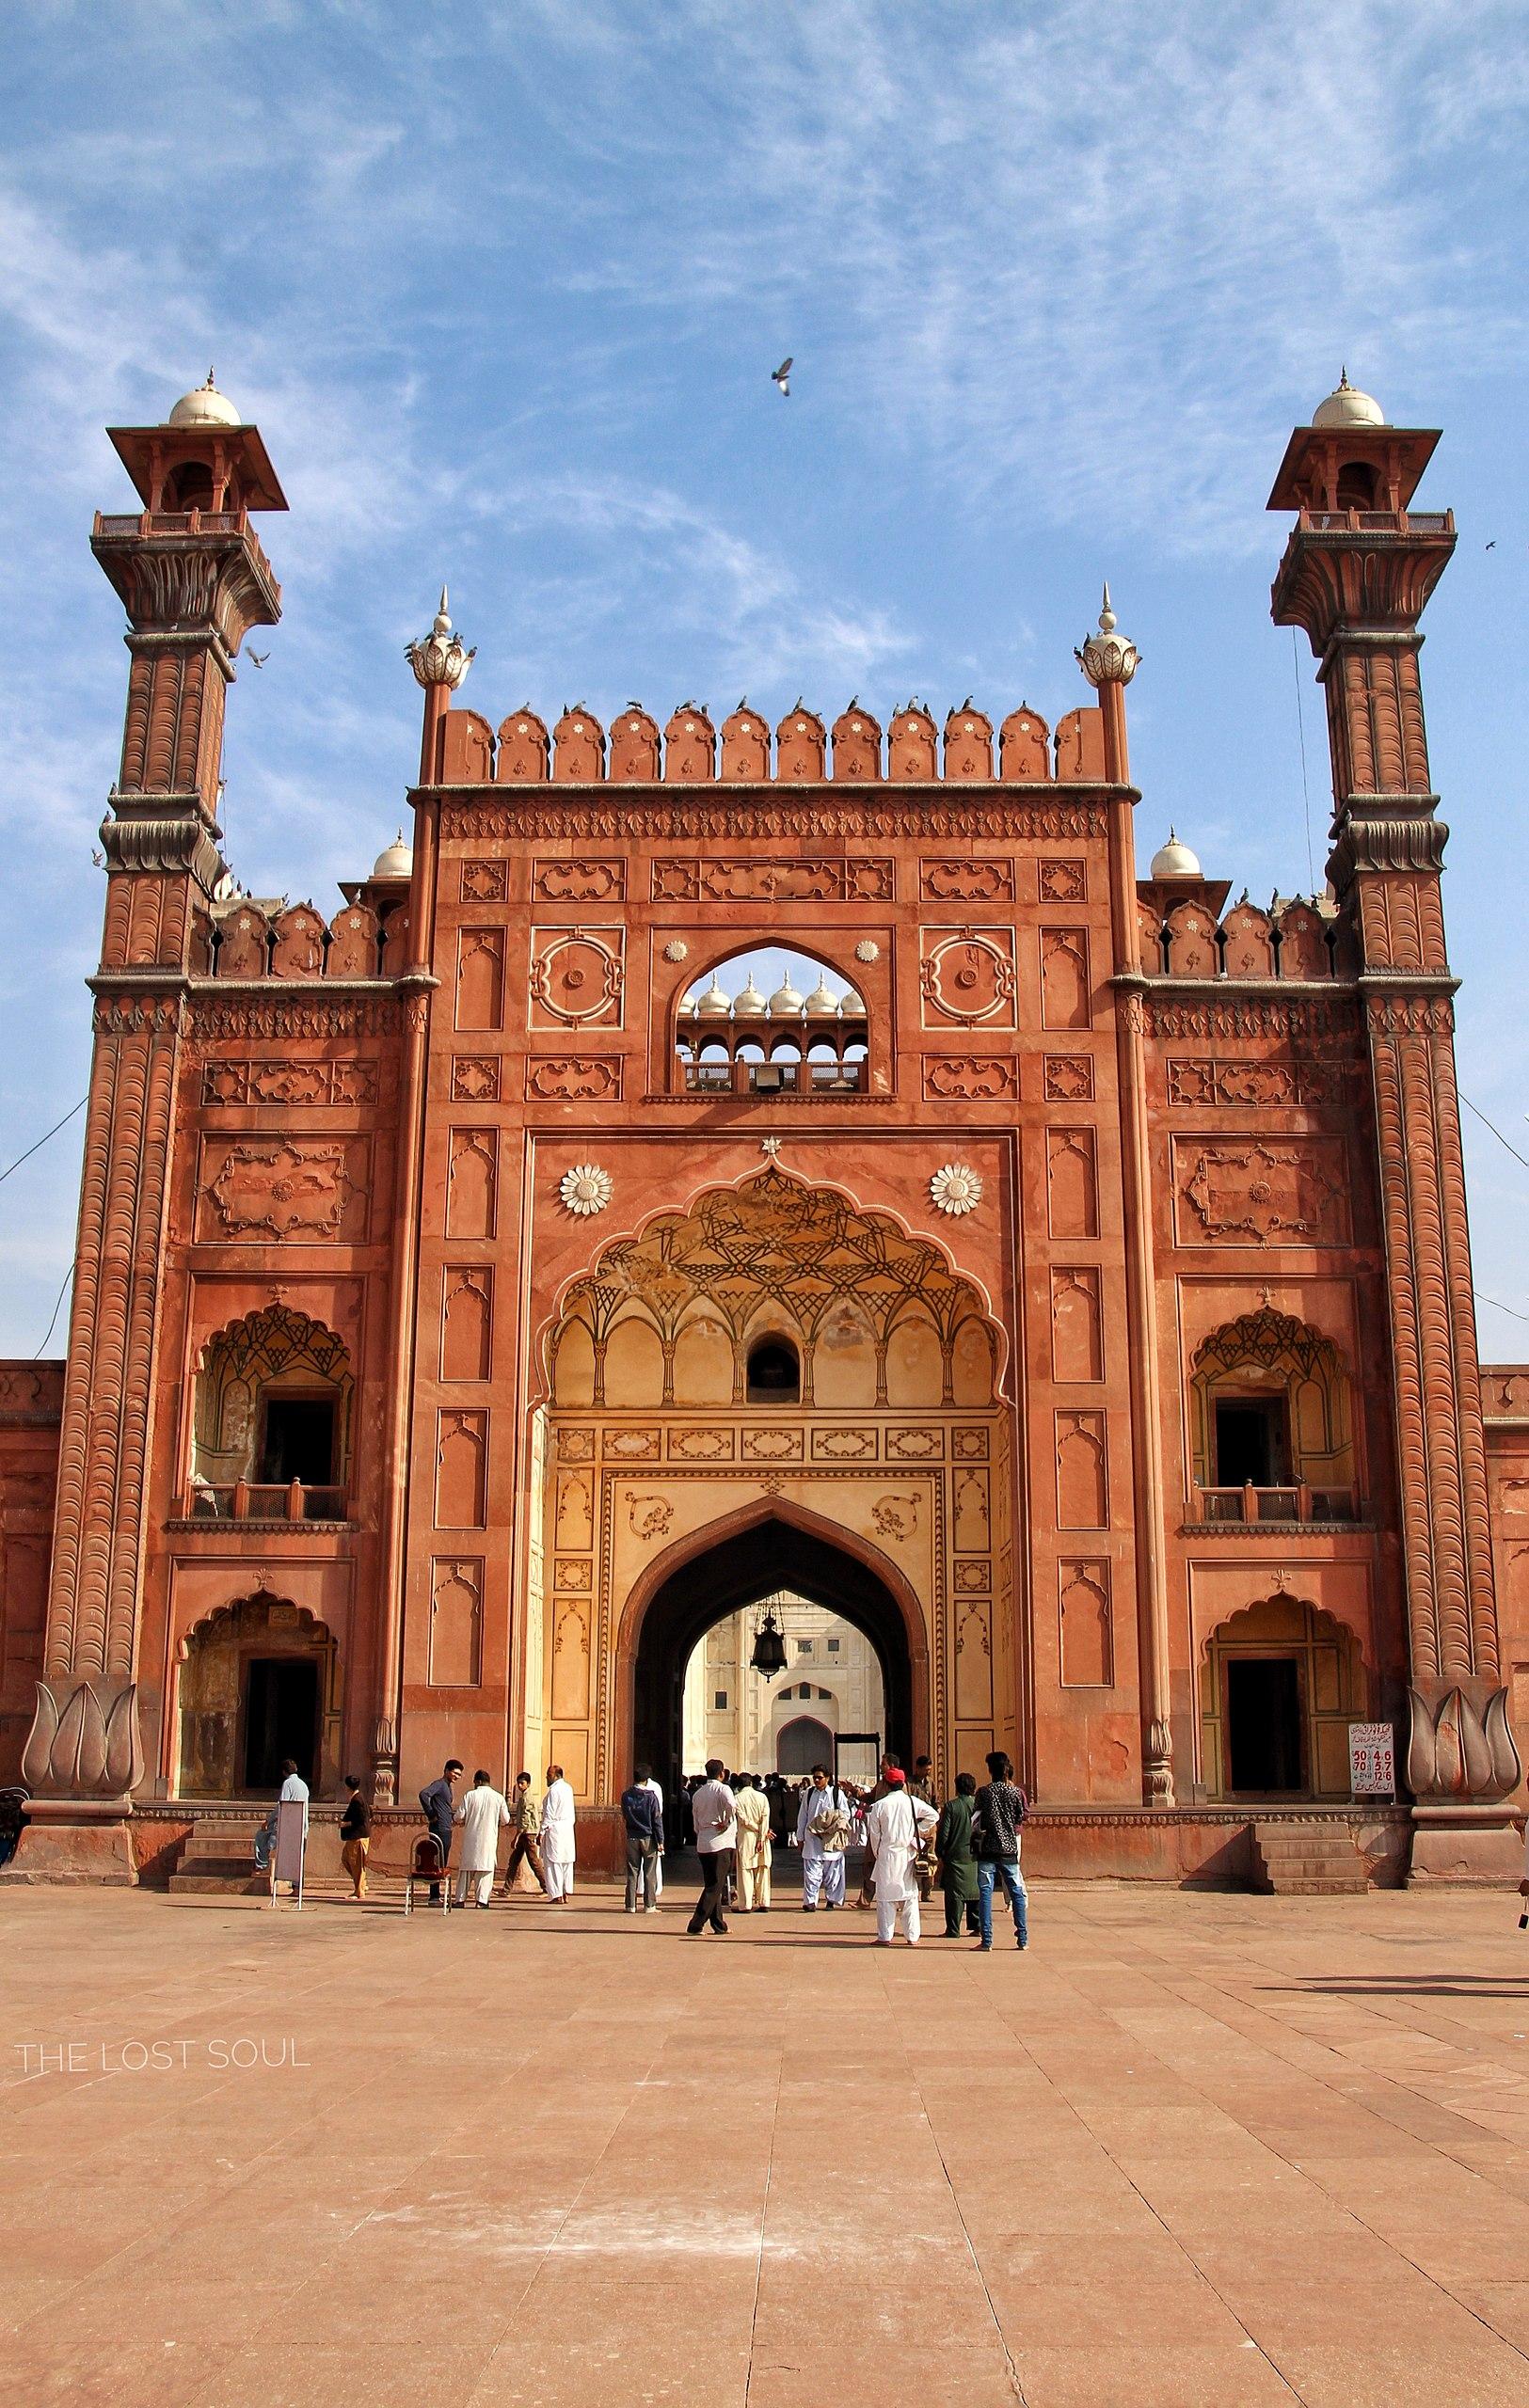 _1625px-Badshahi_Mosque_2C_Lahore_II_3083252252505783006.jpg